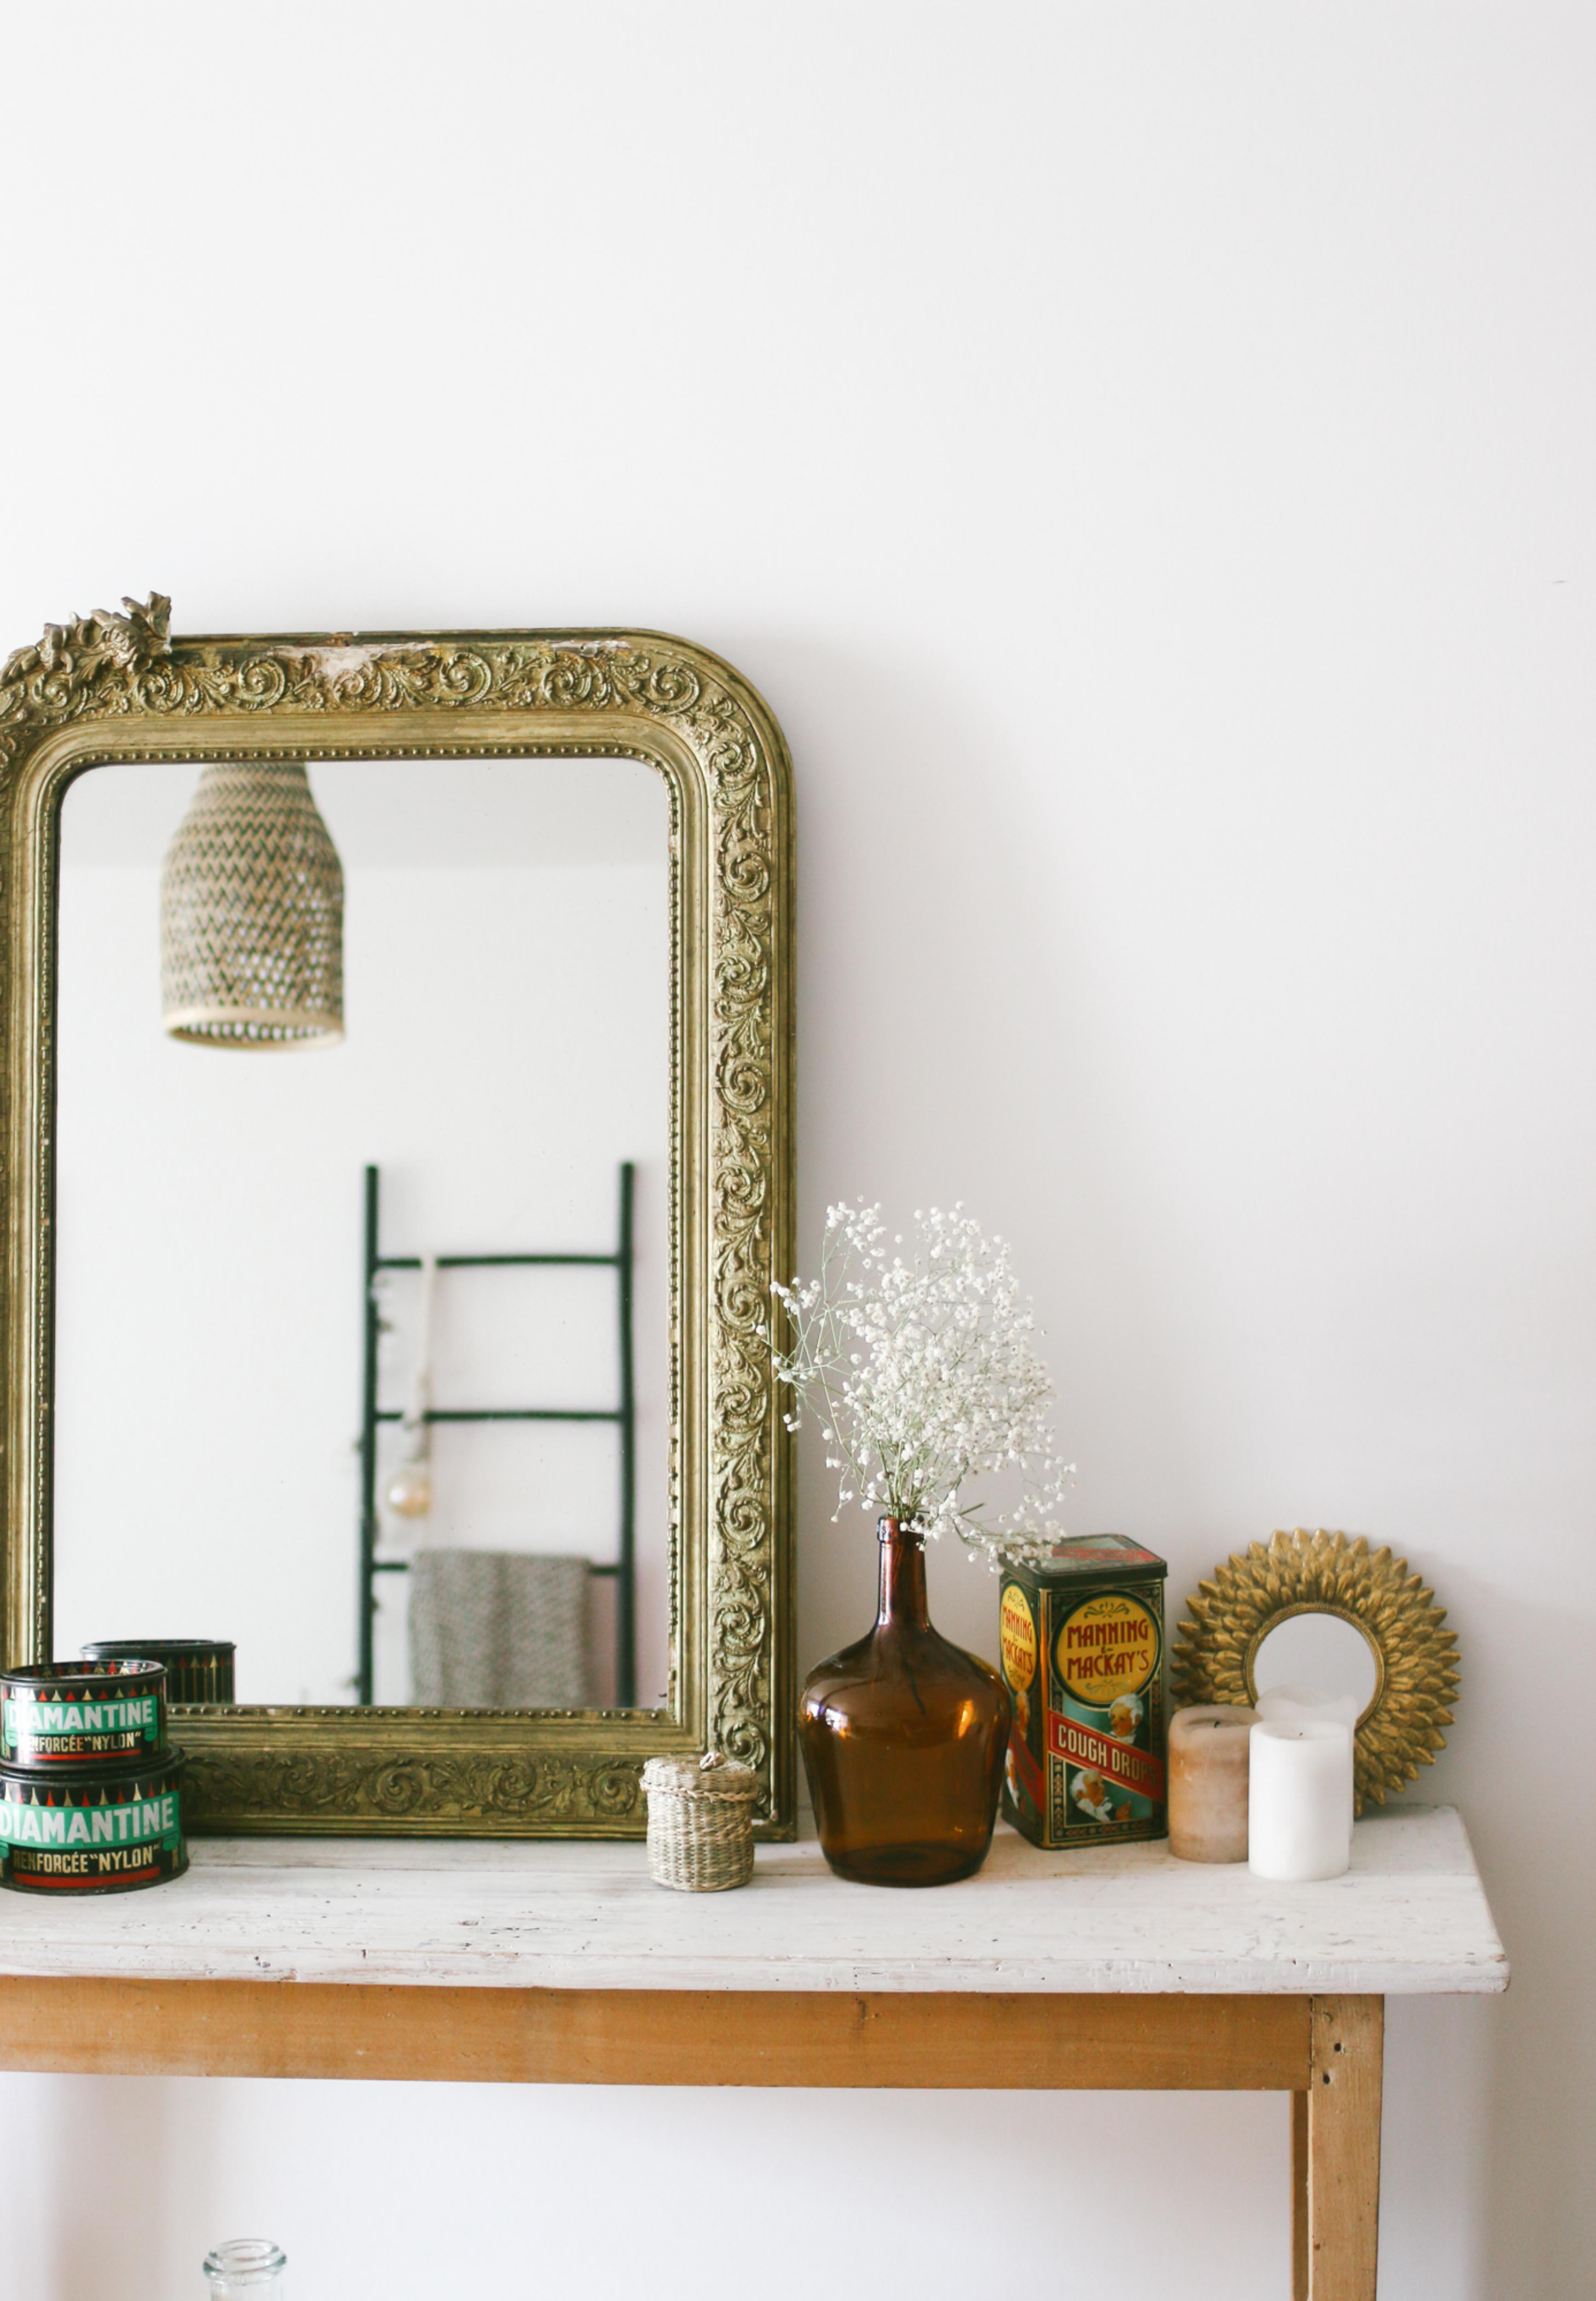 id es d coration appartement blog she wears blogueuse mode marseille. Black Bedroom Furniture Sets. Home Design Ideas